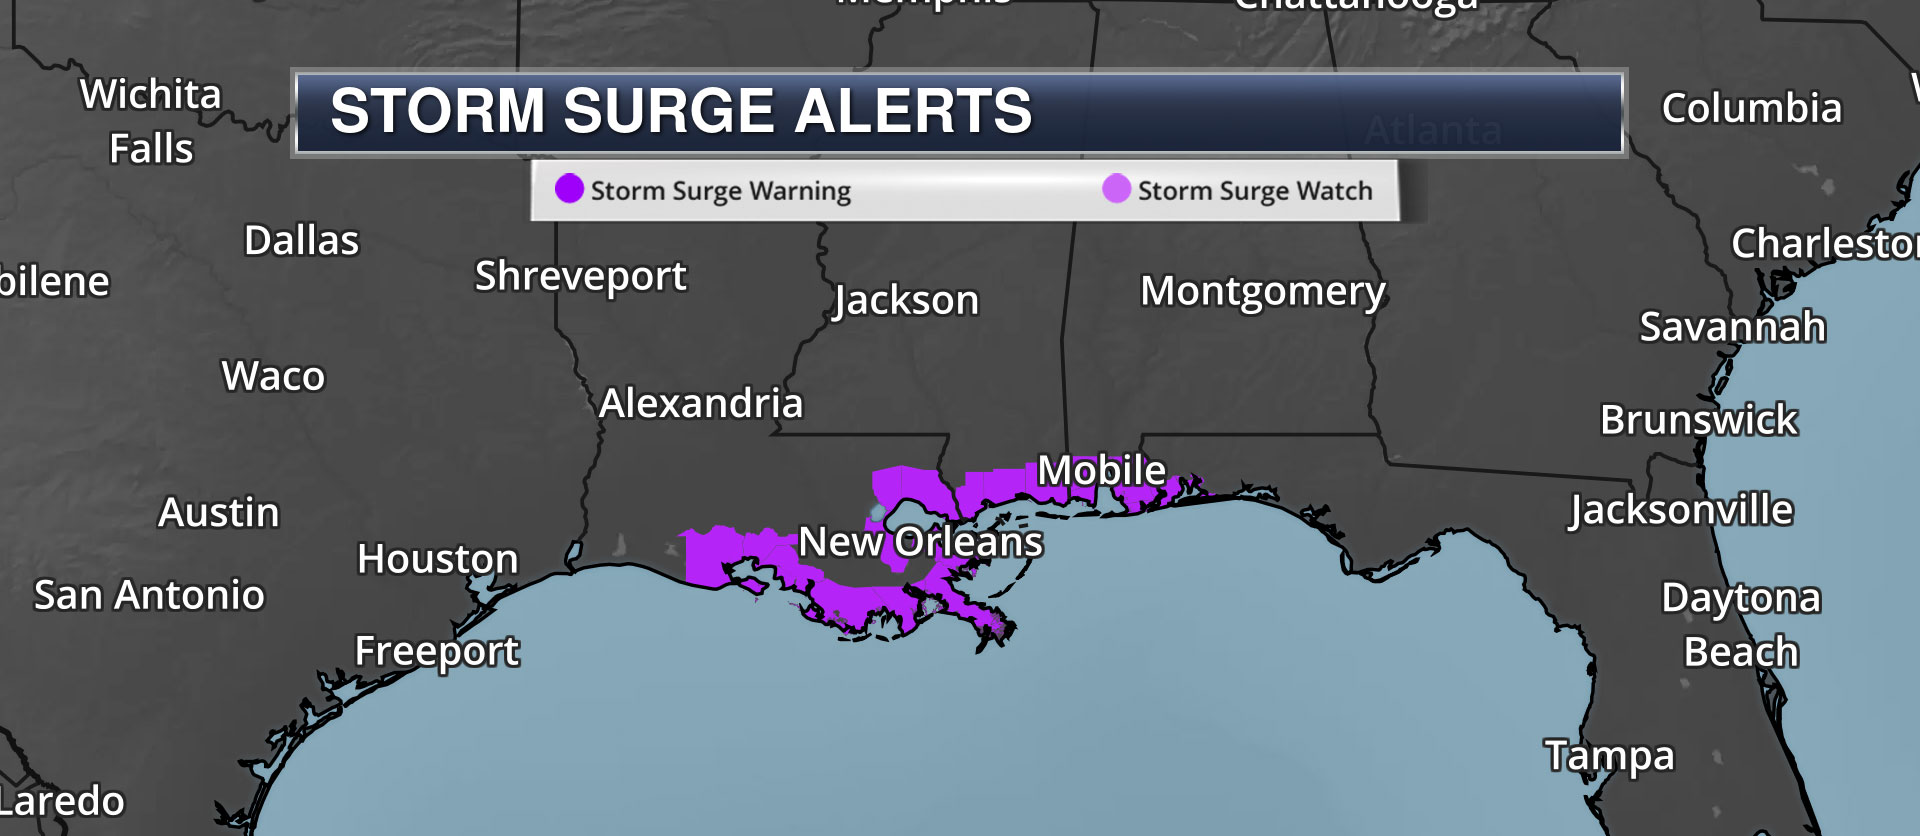 storm-surge-alerts-10-radar